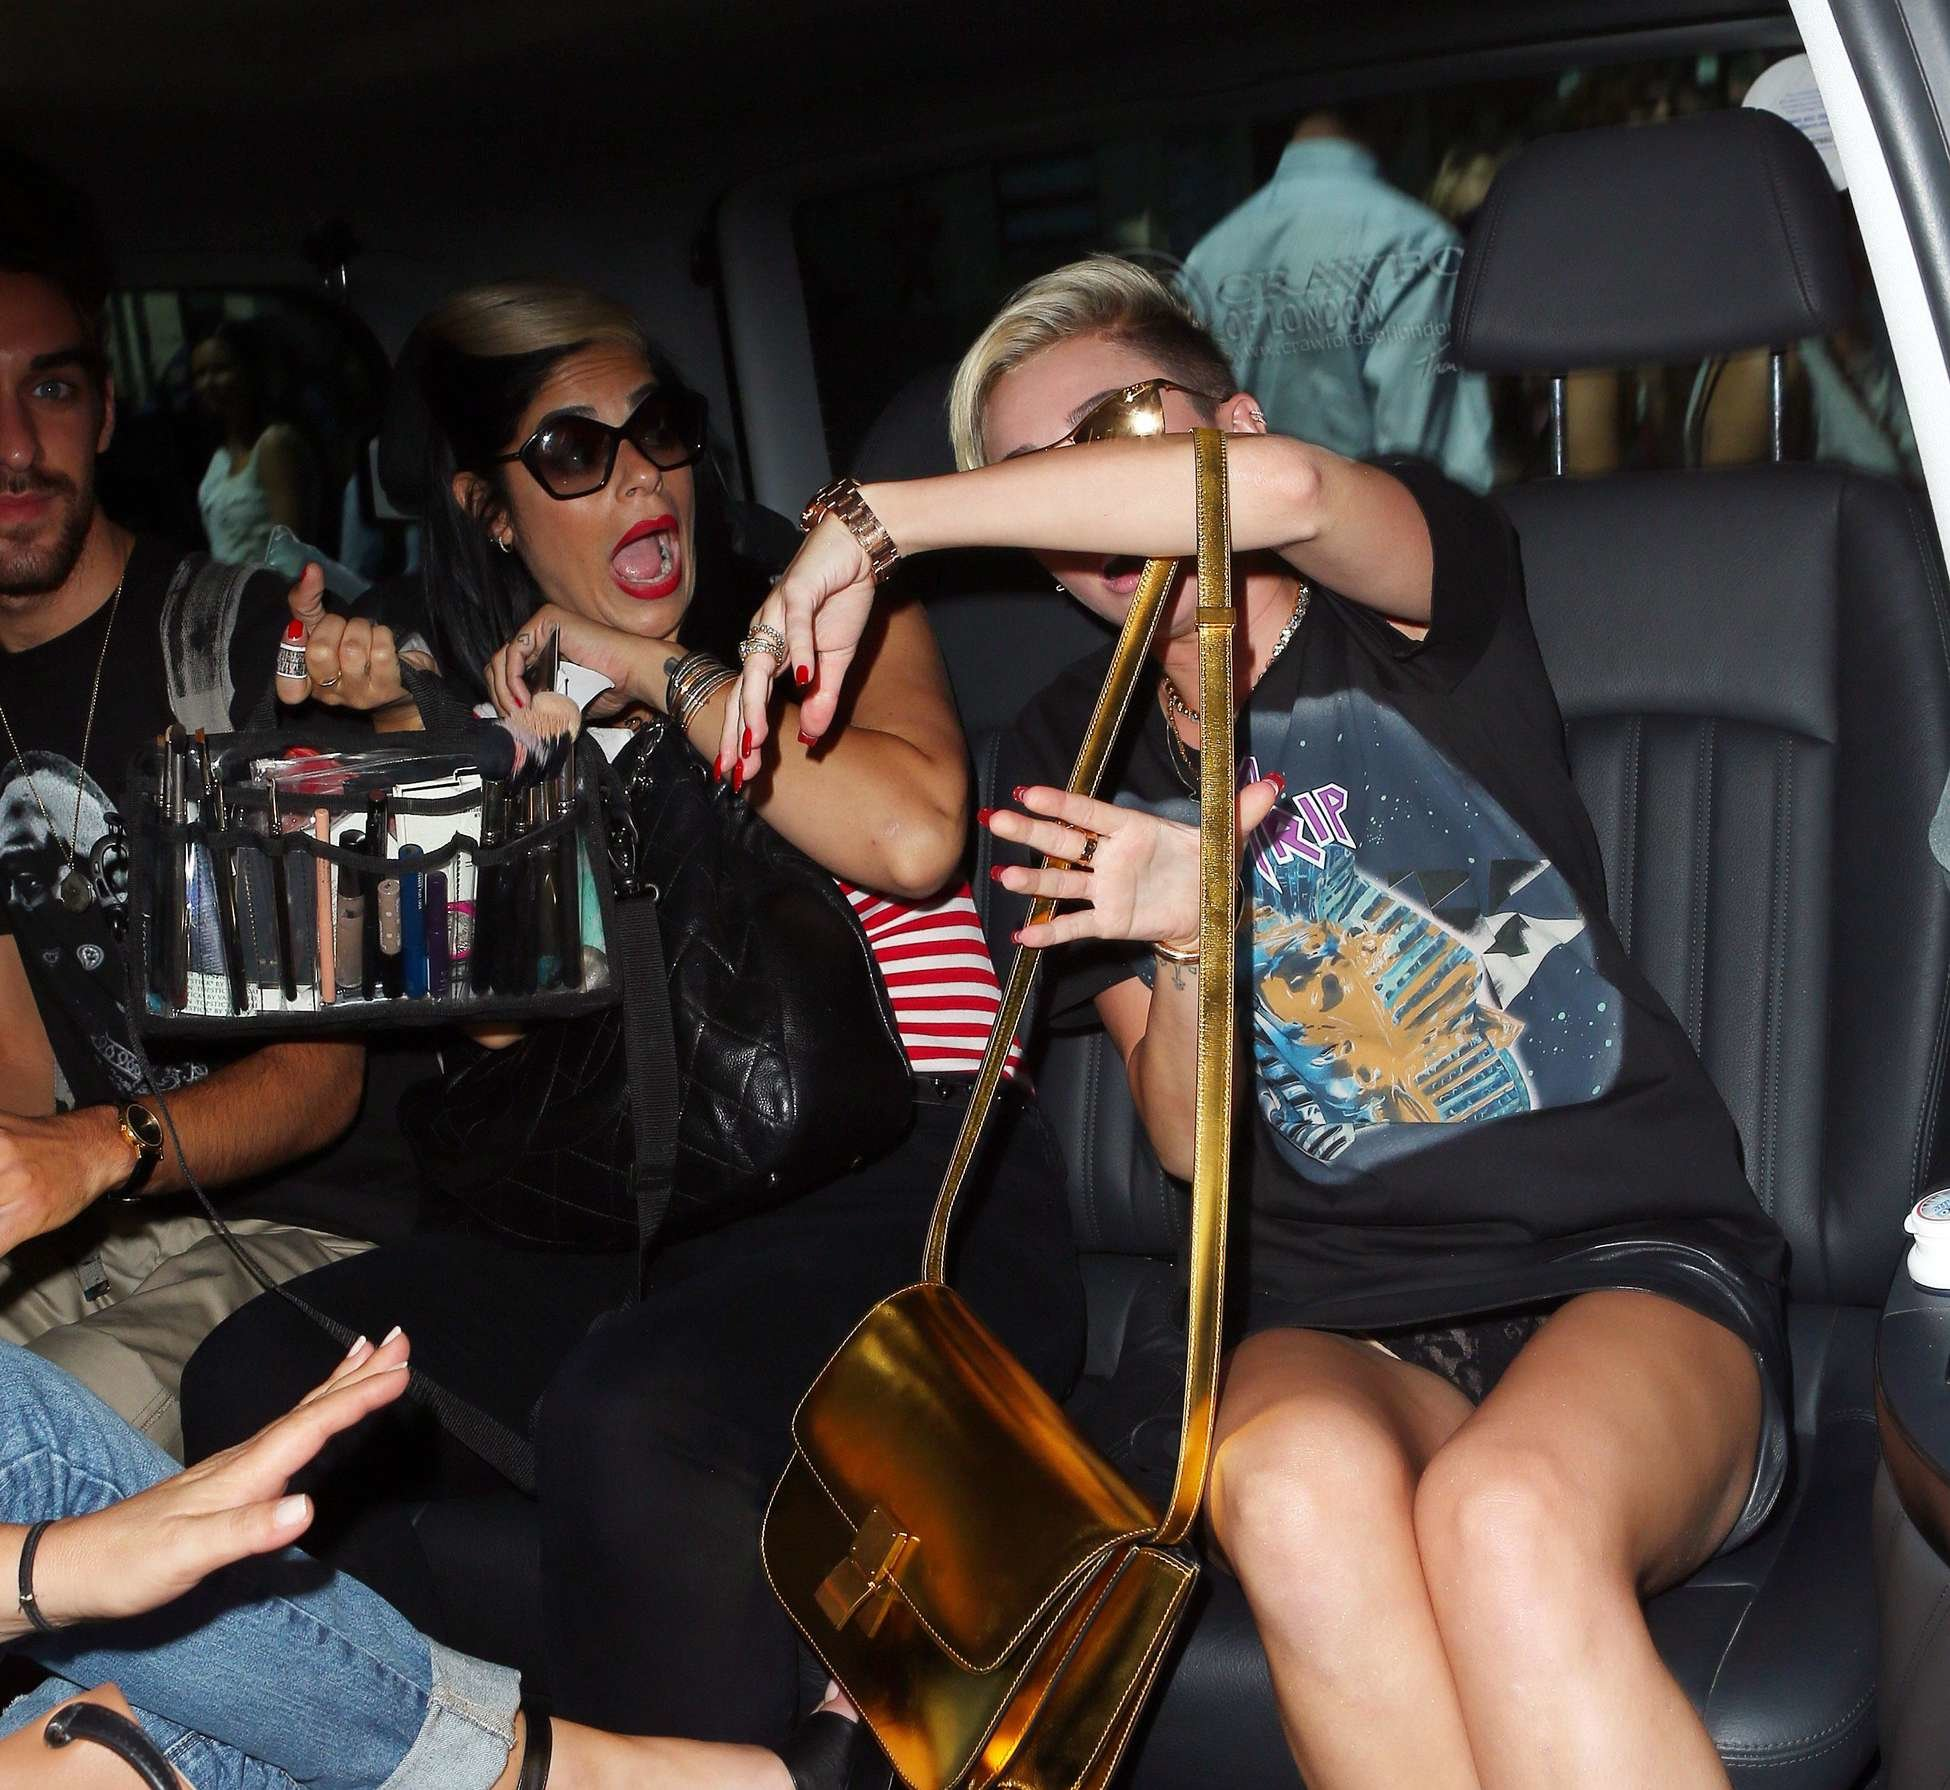 Cyrus upskirt car, shared sexy woman